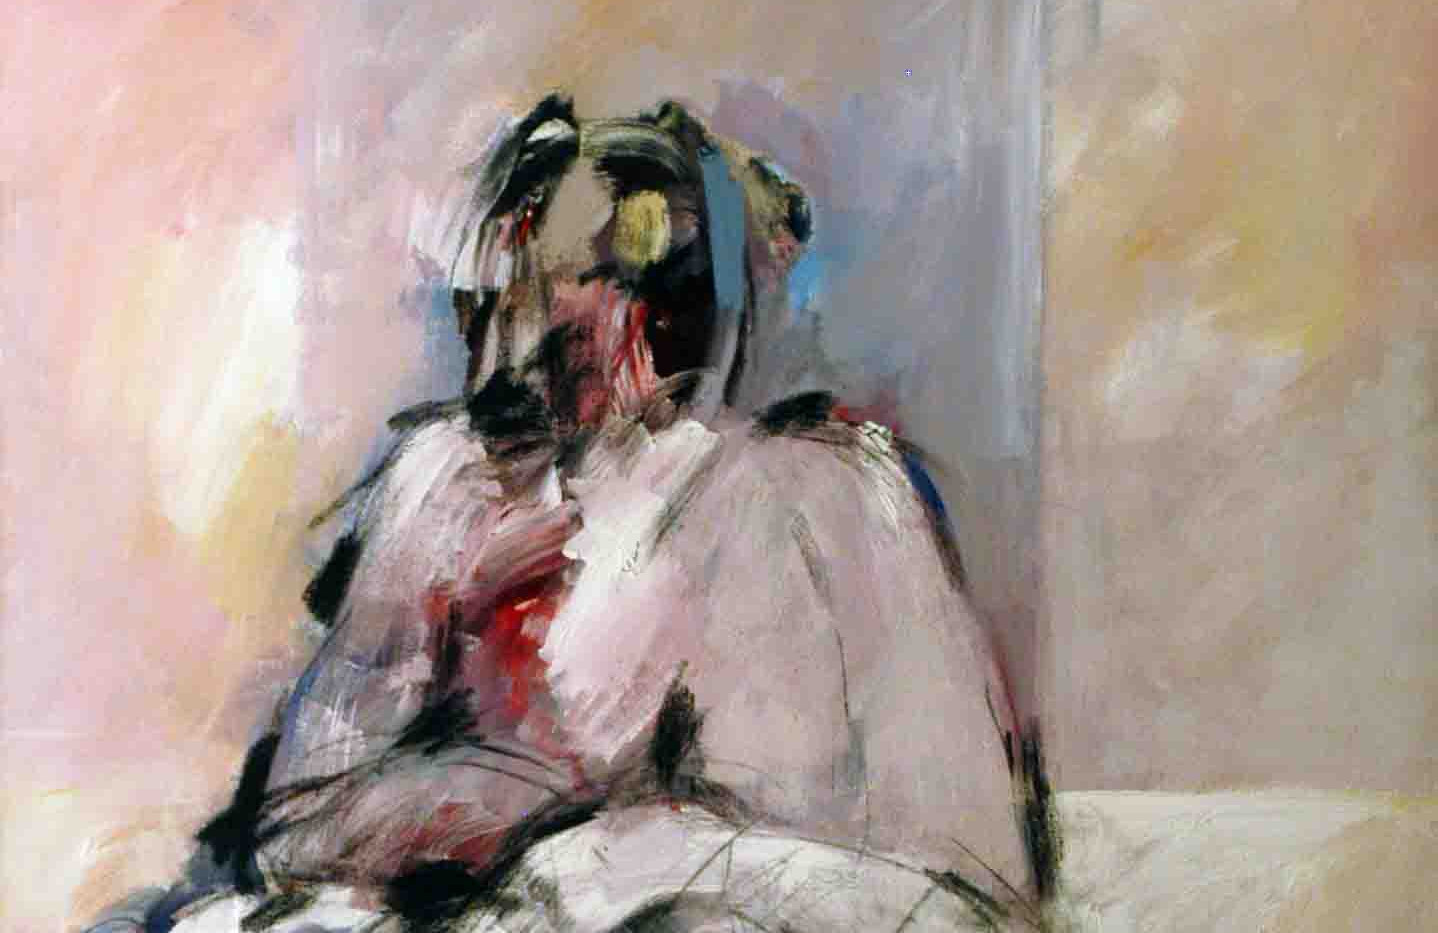 Abdul Raheem Salem Me and She Acrylic on canvas 150 x 100 cm 2006